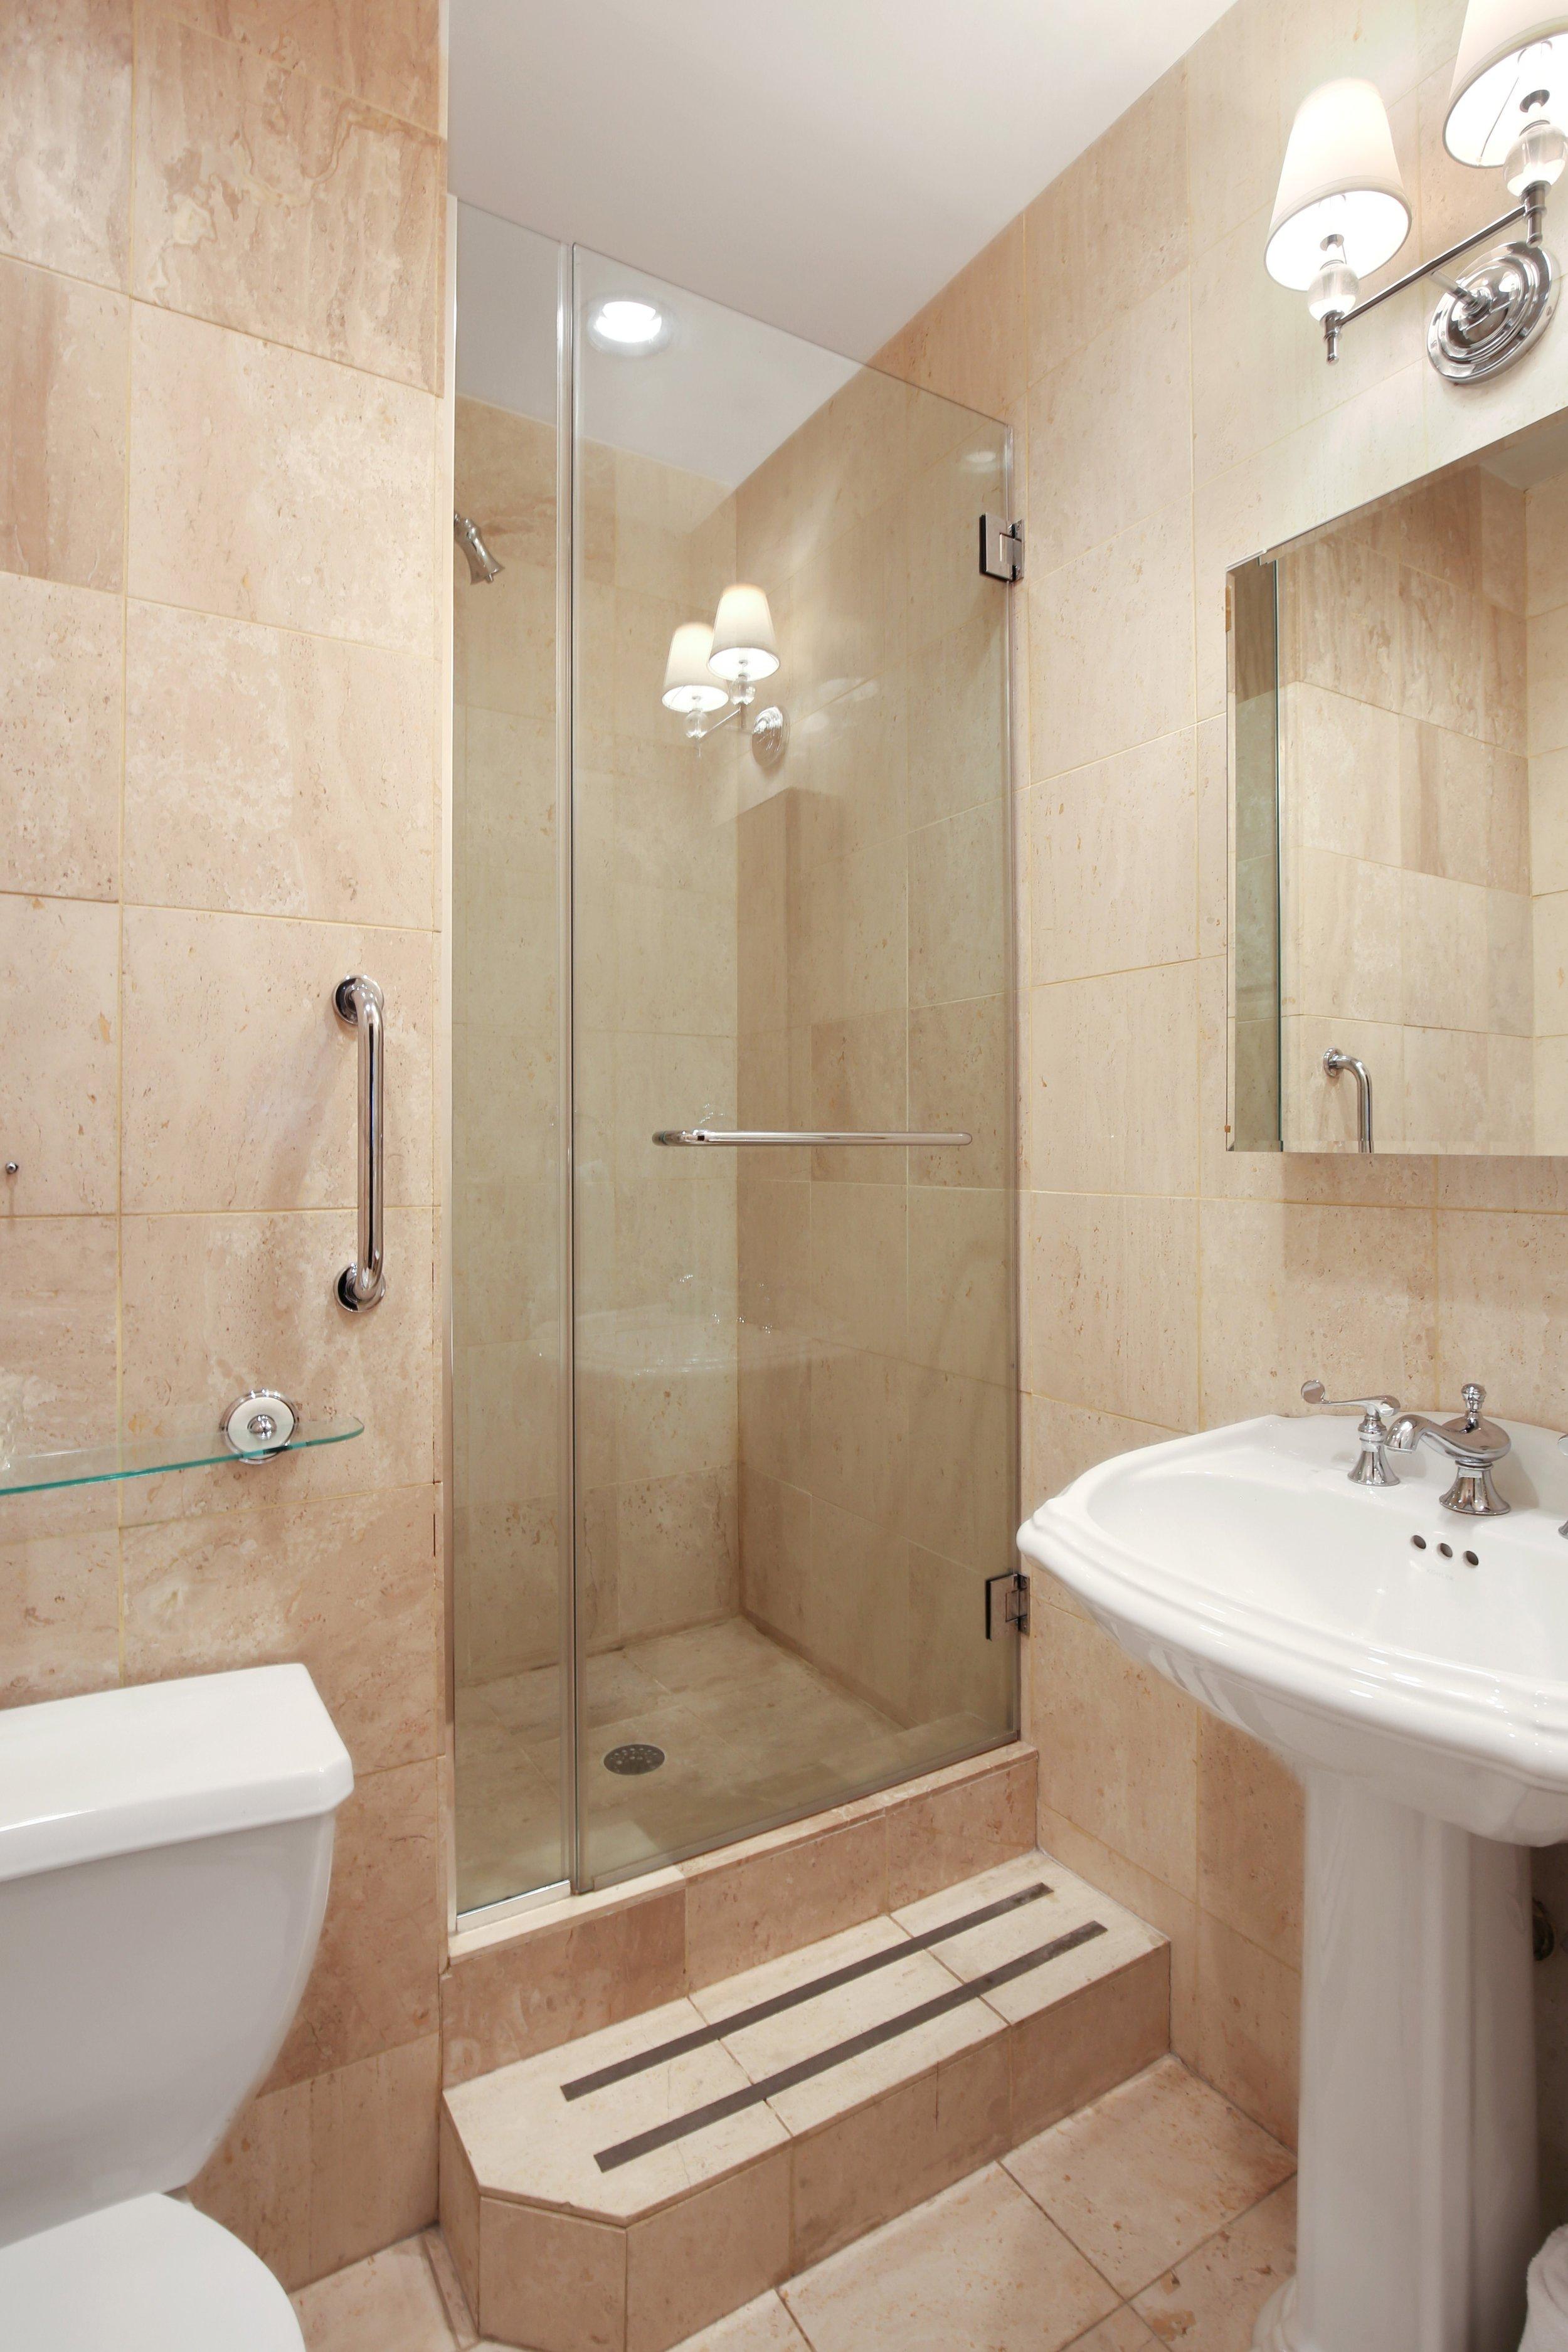 09_75LivingstonStreet_6A_8_Bathroom_HiRes.jpg